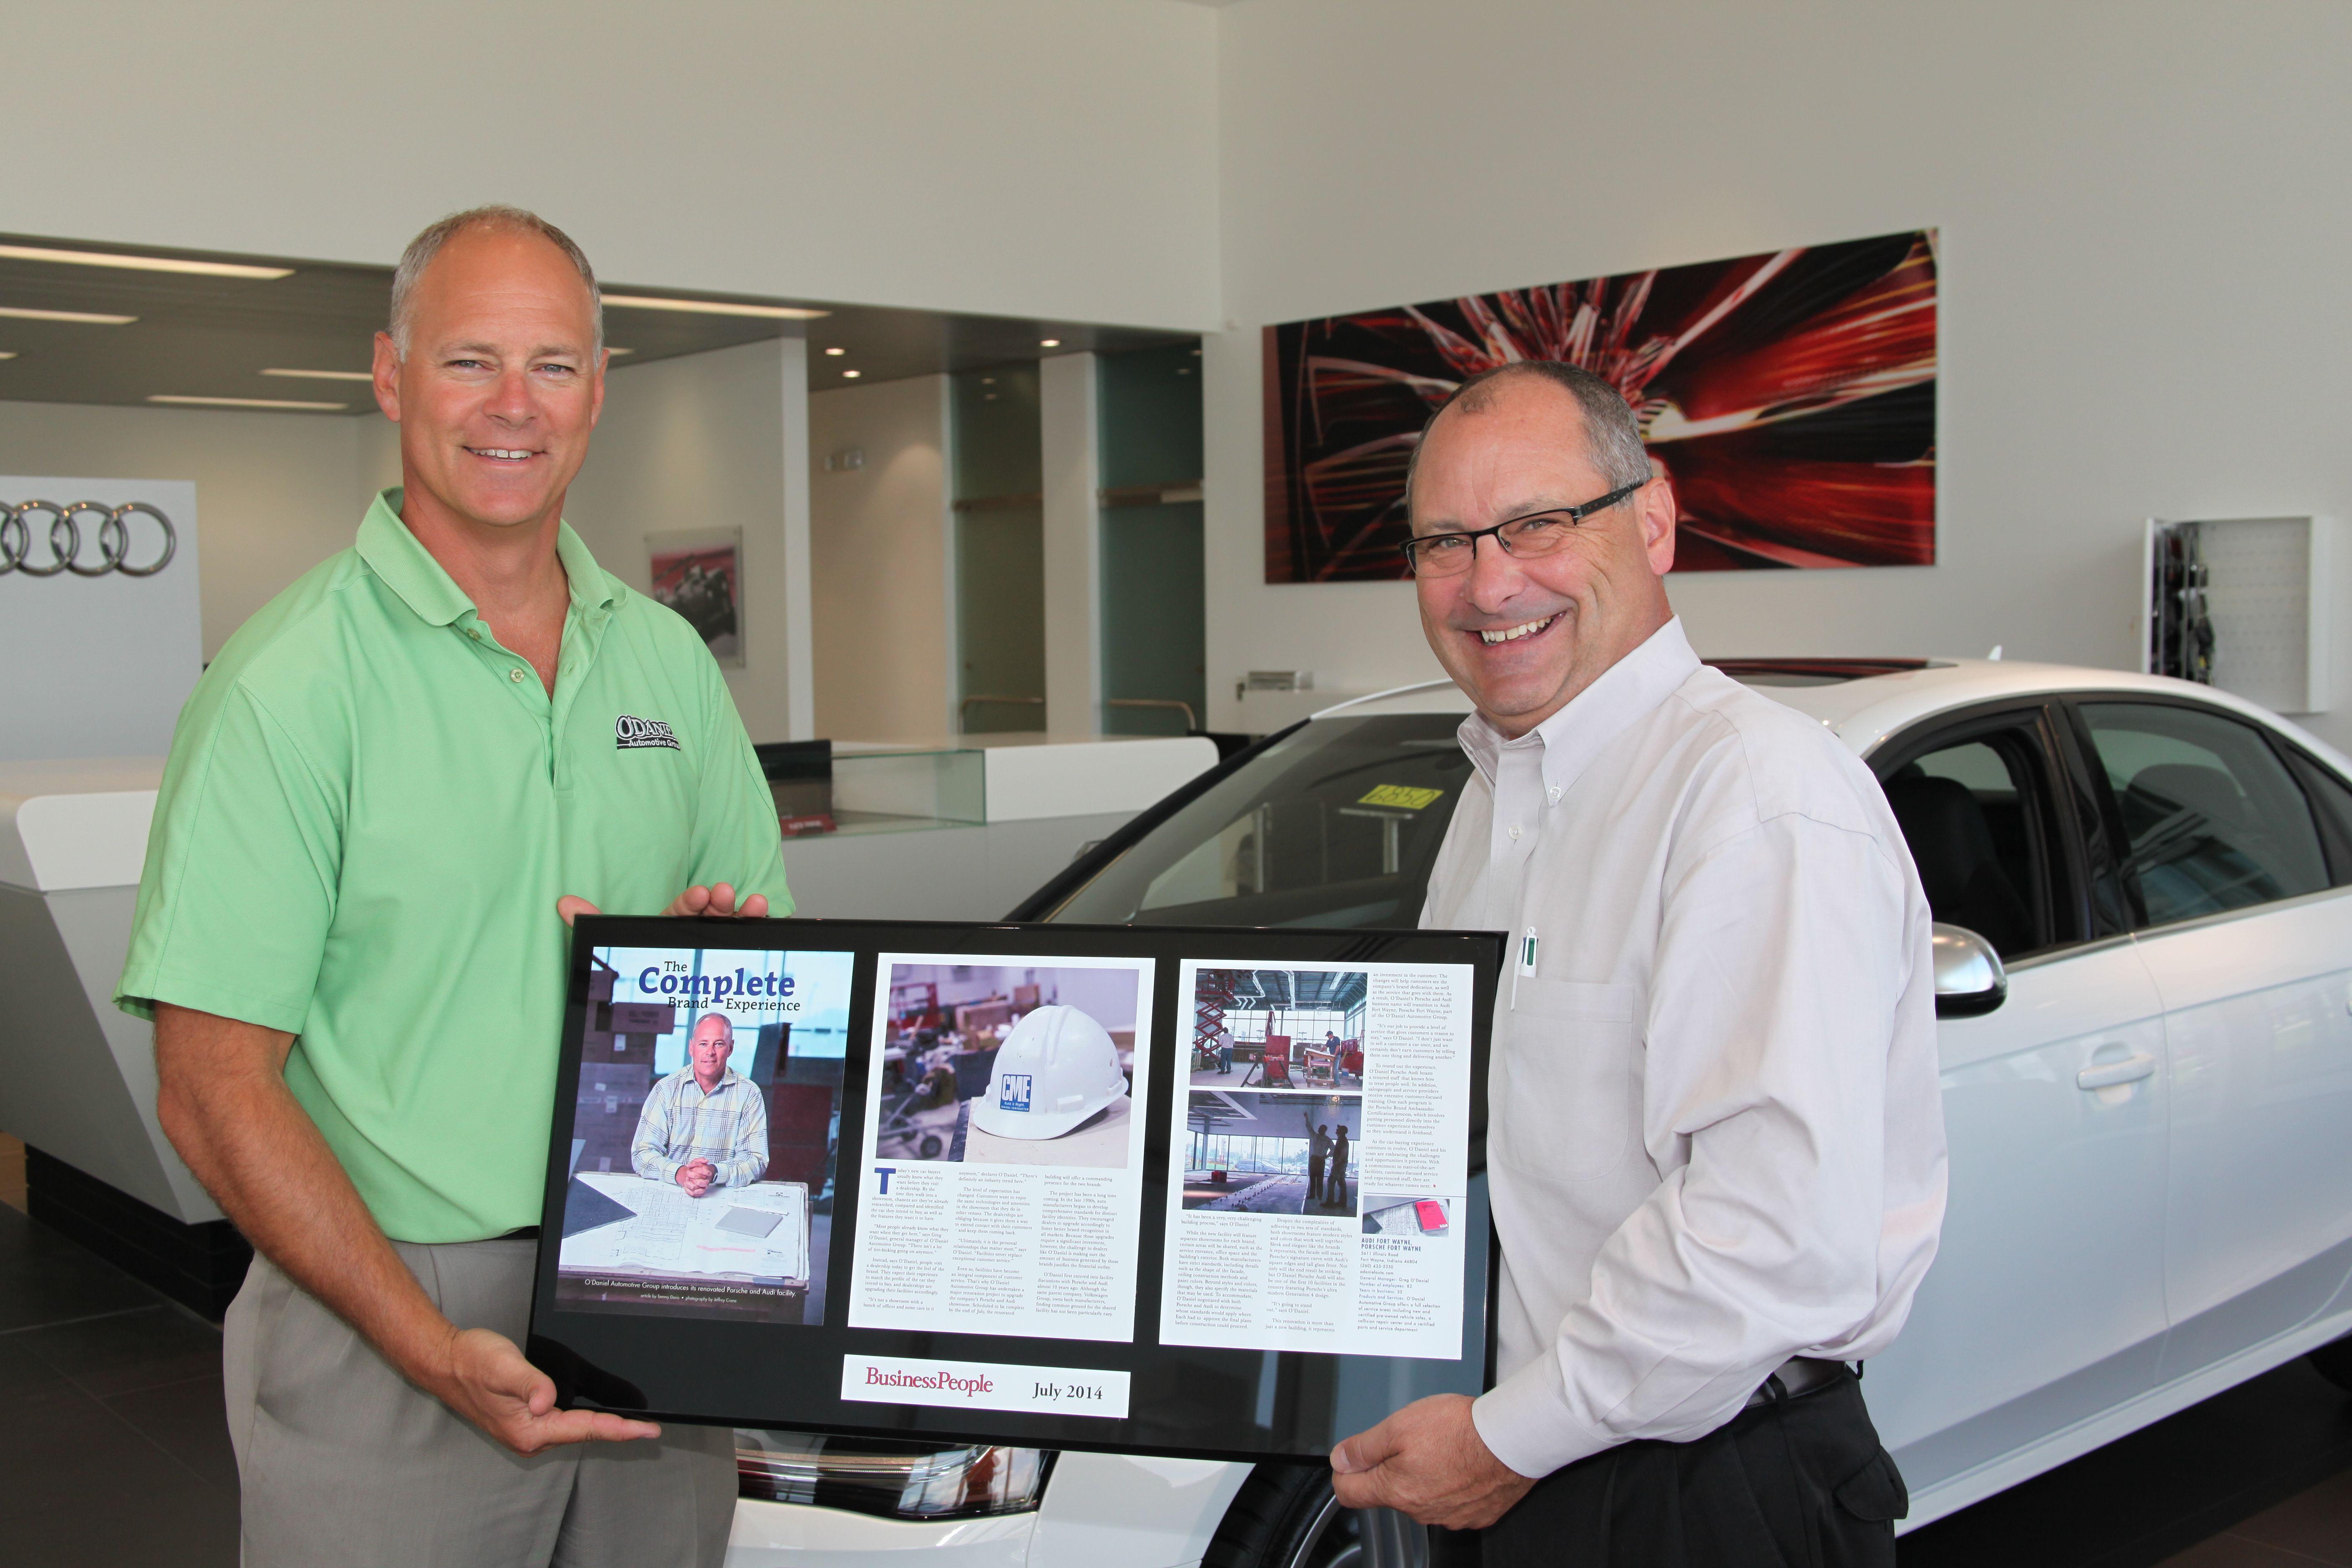 Greg O Daniel Receiving Plaque From Mark Hellinger On The Completion Of Audi Fort Wayne Porsche Dealerships Renovation And Expansion